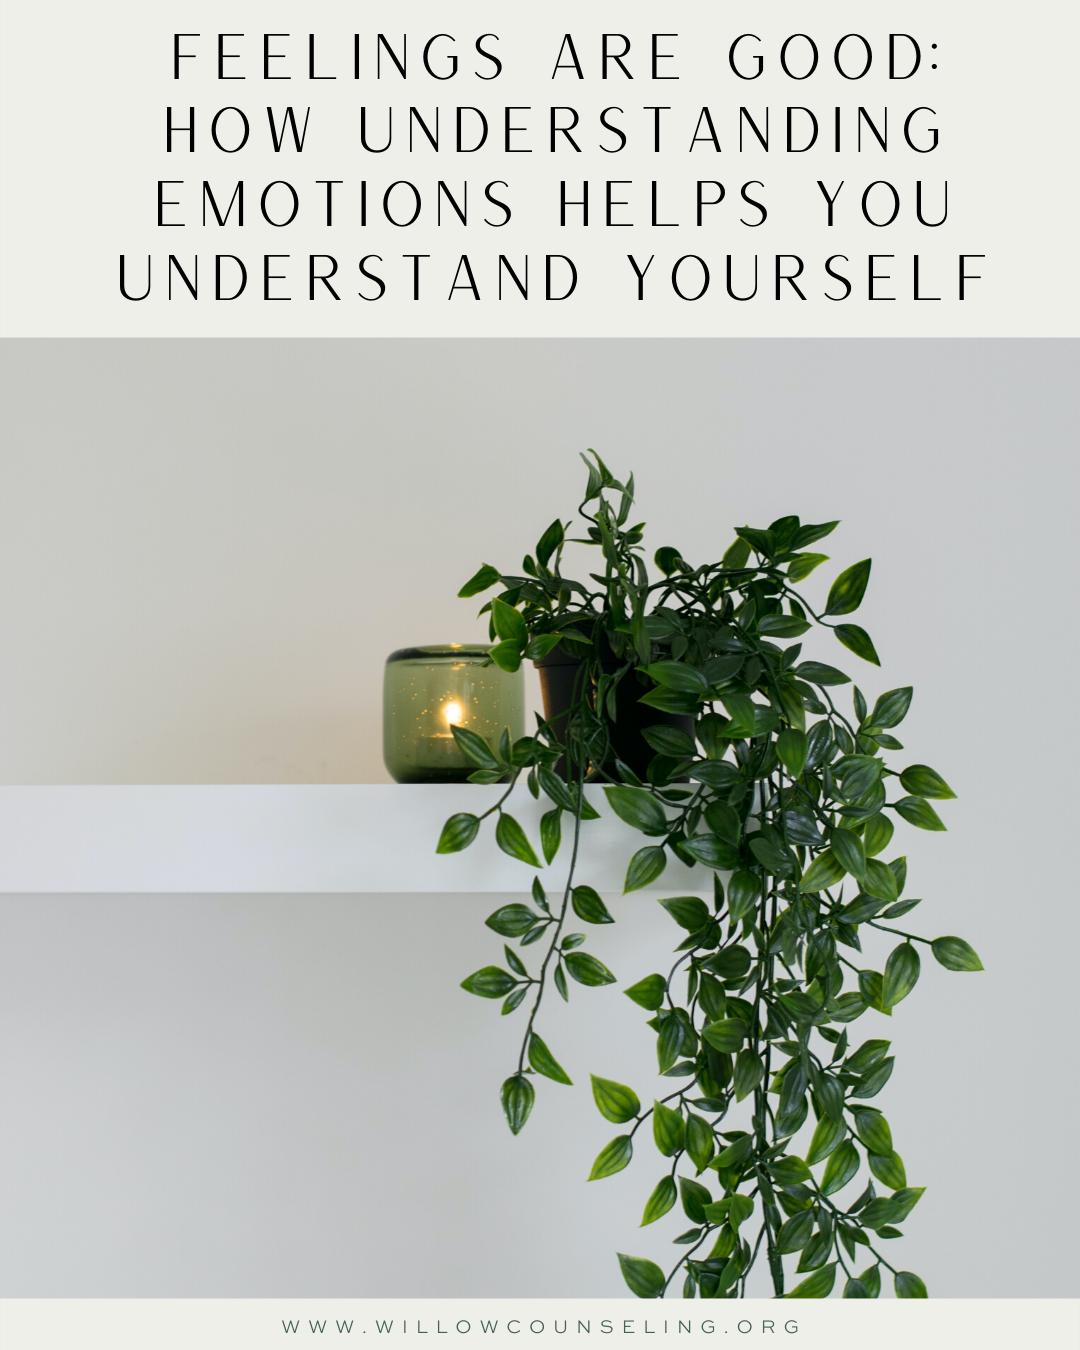 Feelings Are Good: How Understanding Emotions Helps You Understand Yourself